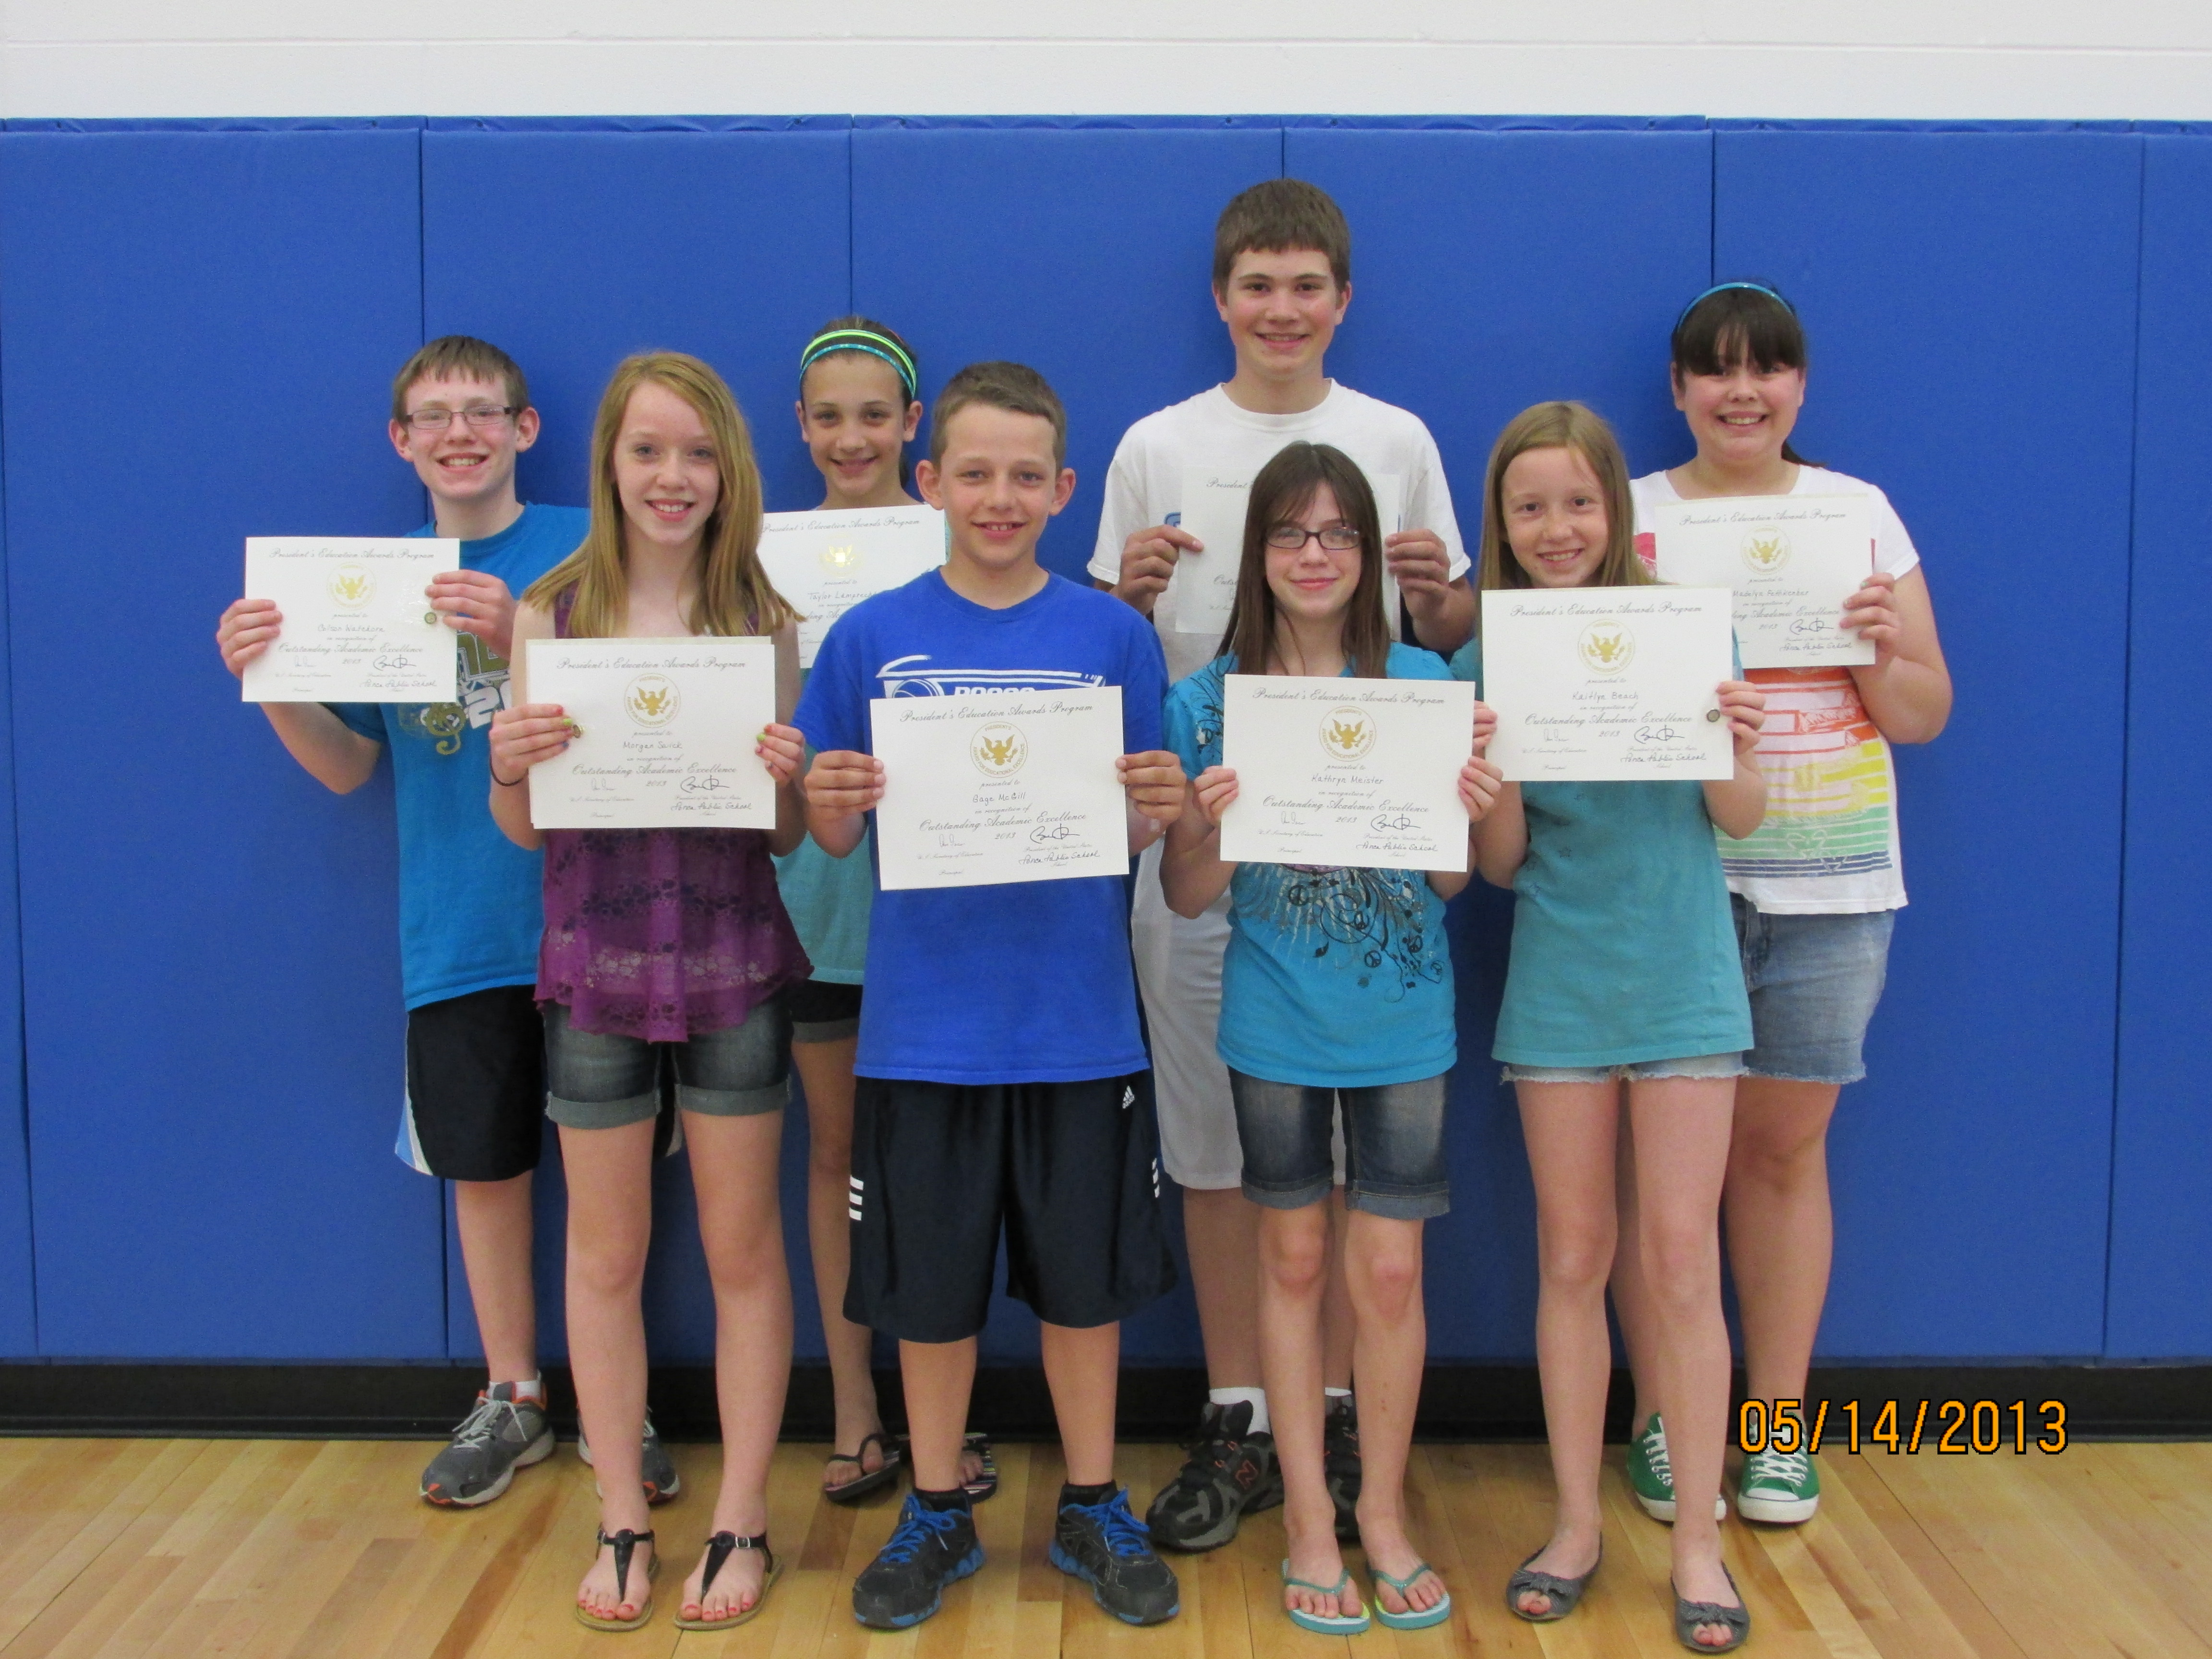 Ponca School - Ponca Sixth Graders Earn Presidential Education Award